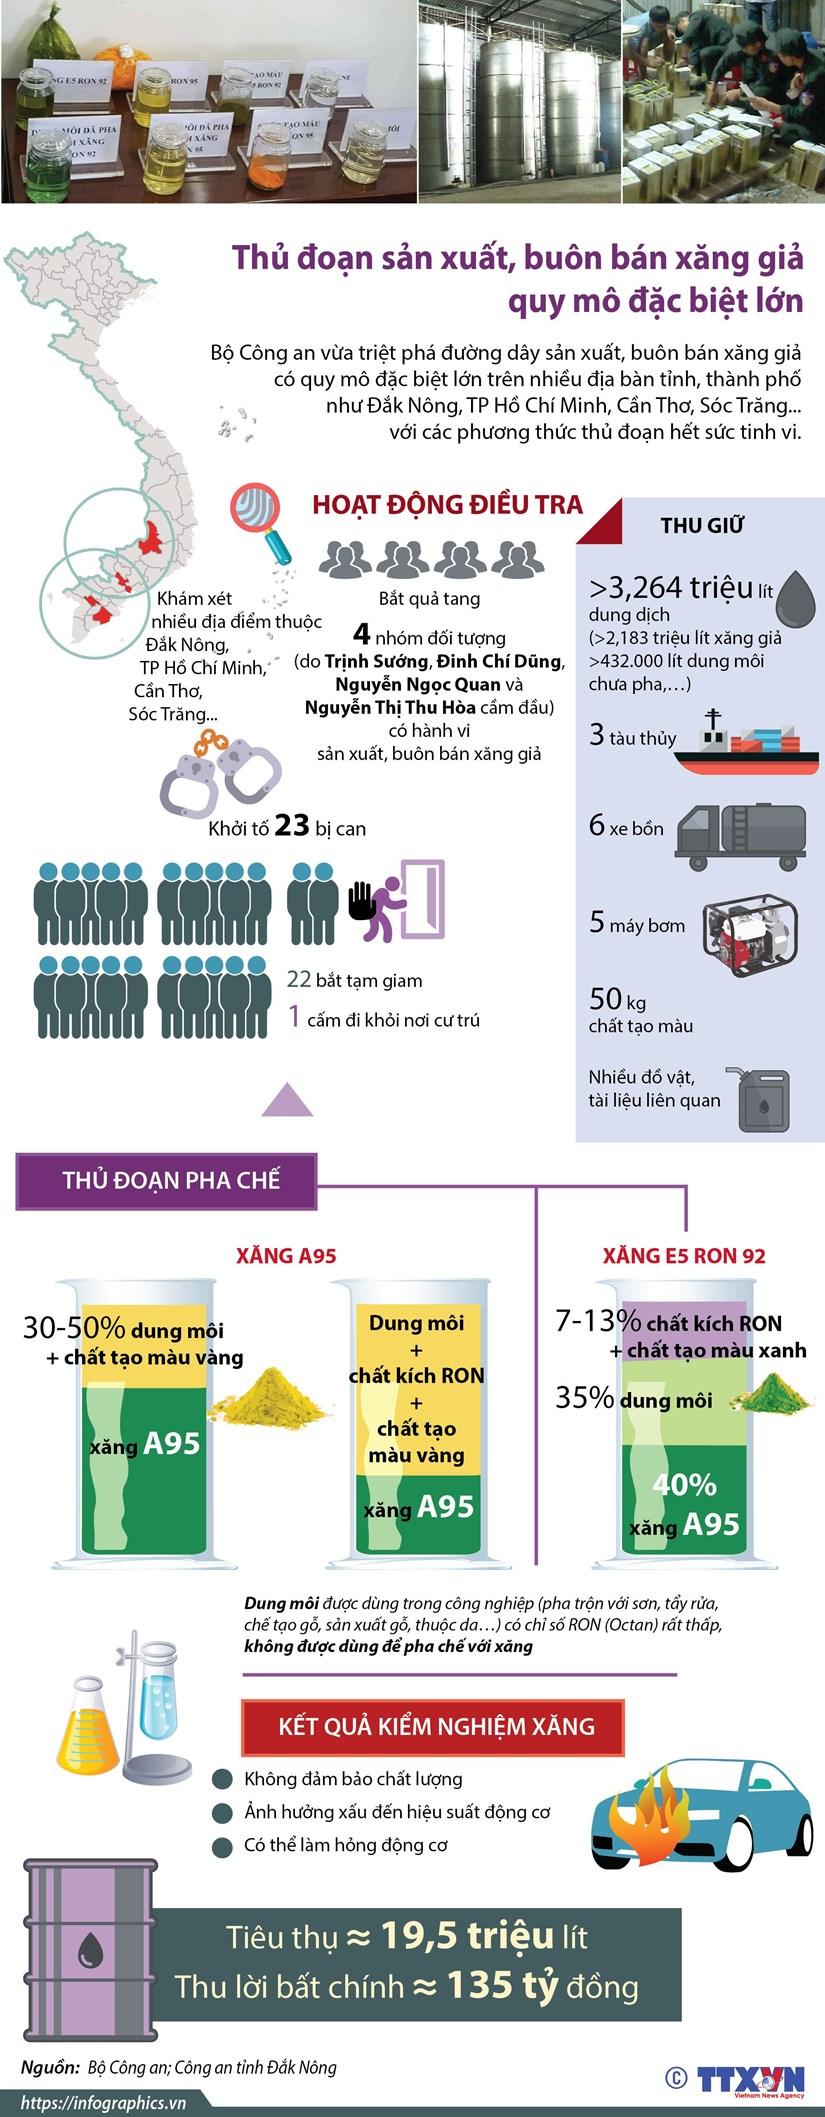 [Infographics] Thu doan san xuat, buon ban xang gia quy mo rat lon hinh anh 1